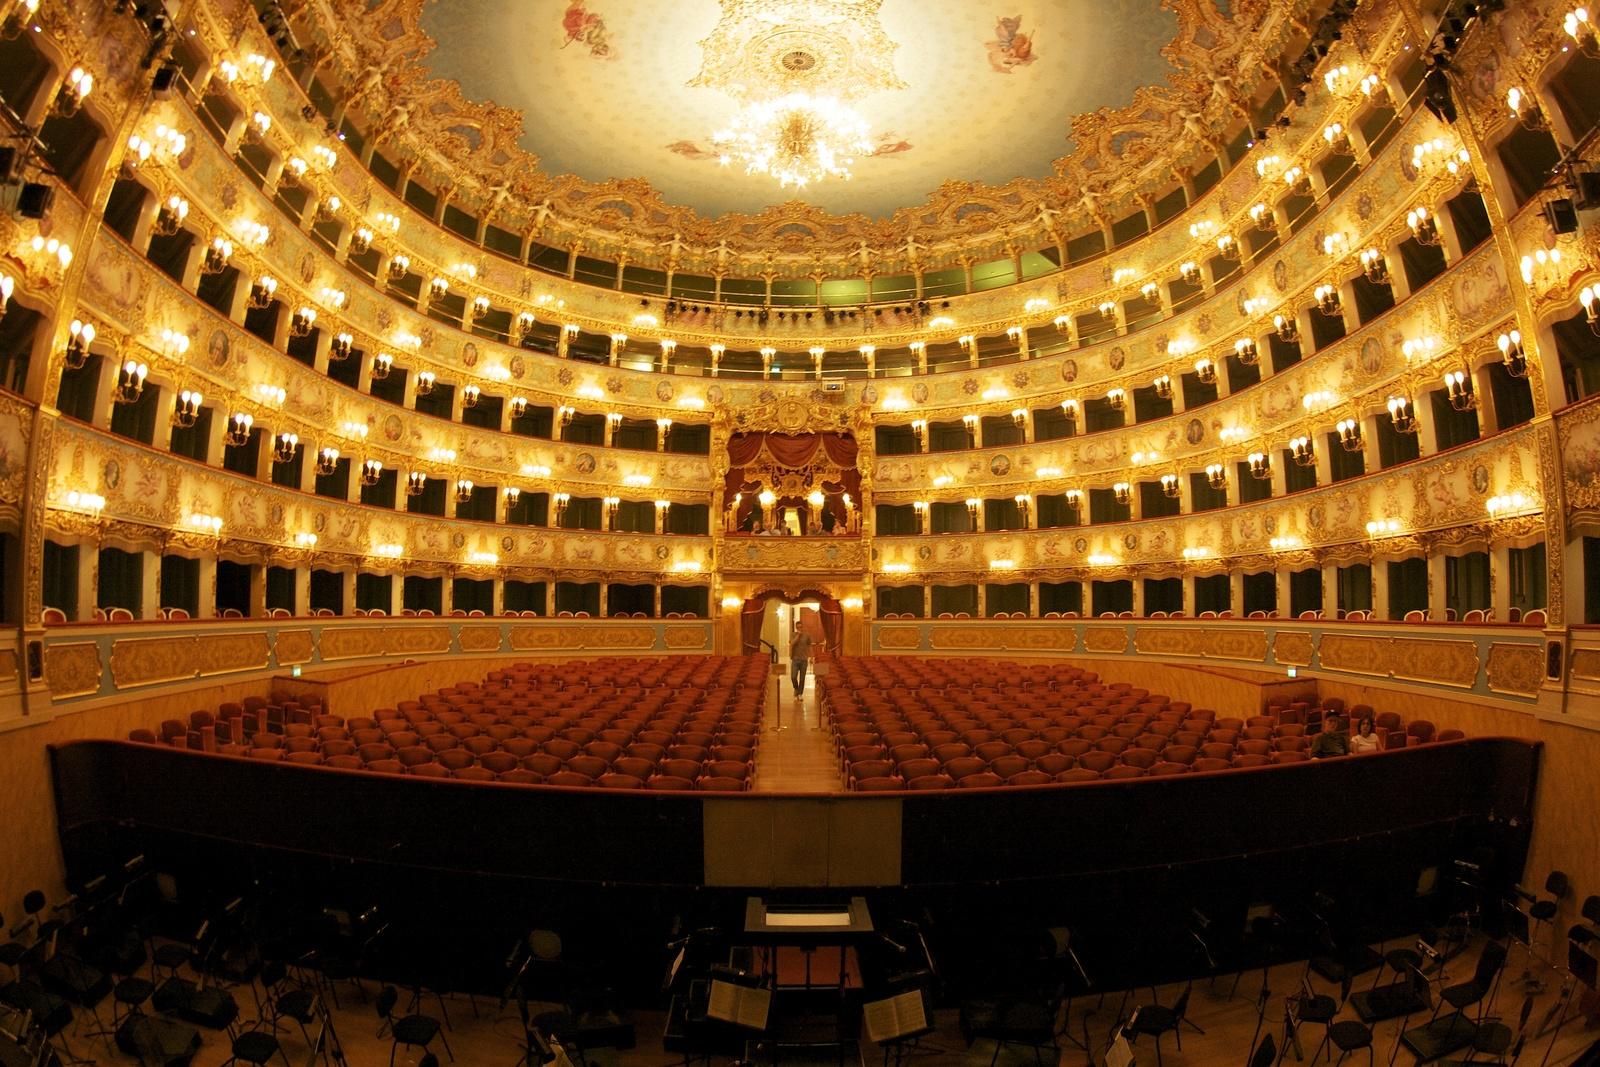 Teatro La Fenice – An iconic opera house